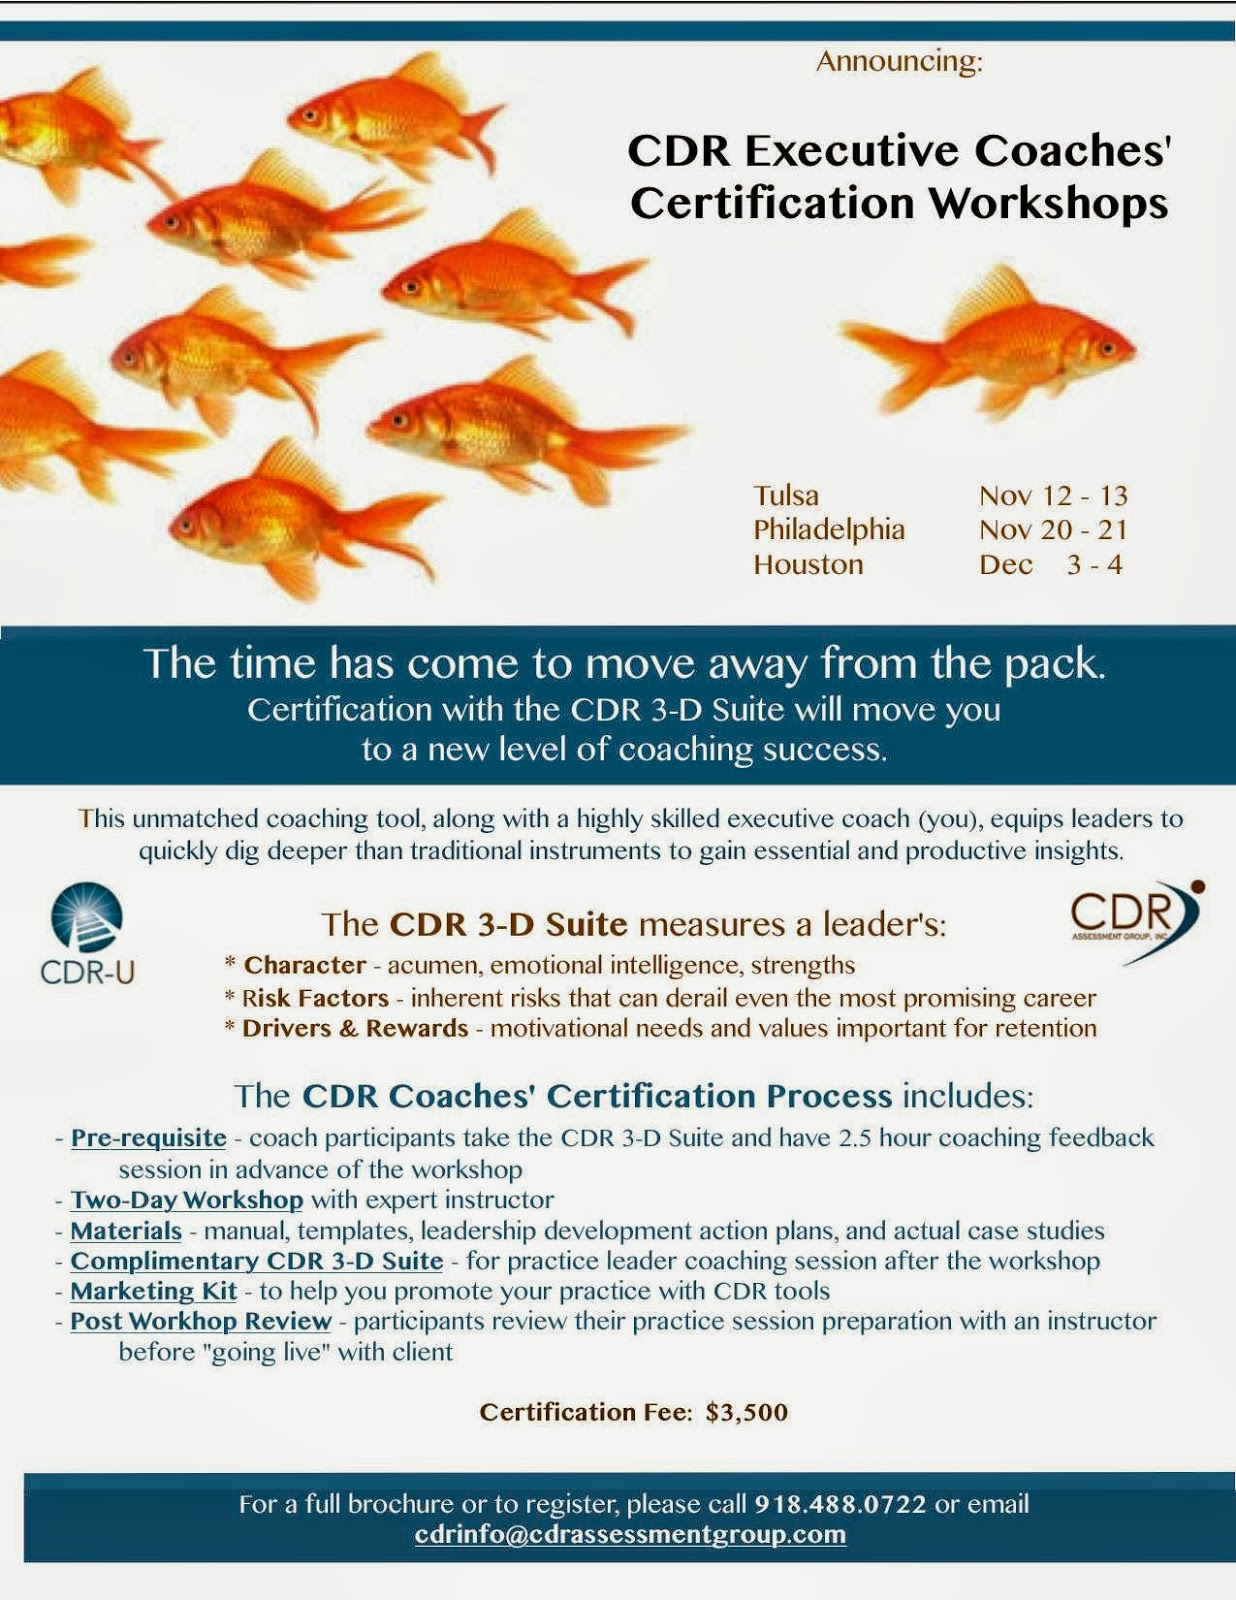 2013 CDR Coaches' Certification Workshop Dates - Philadelphia ...